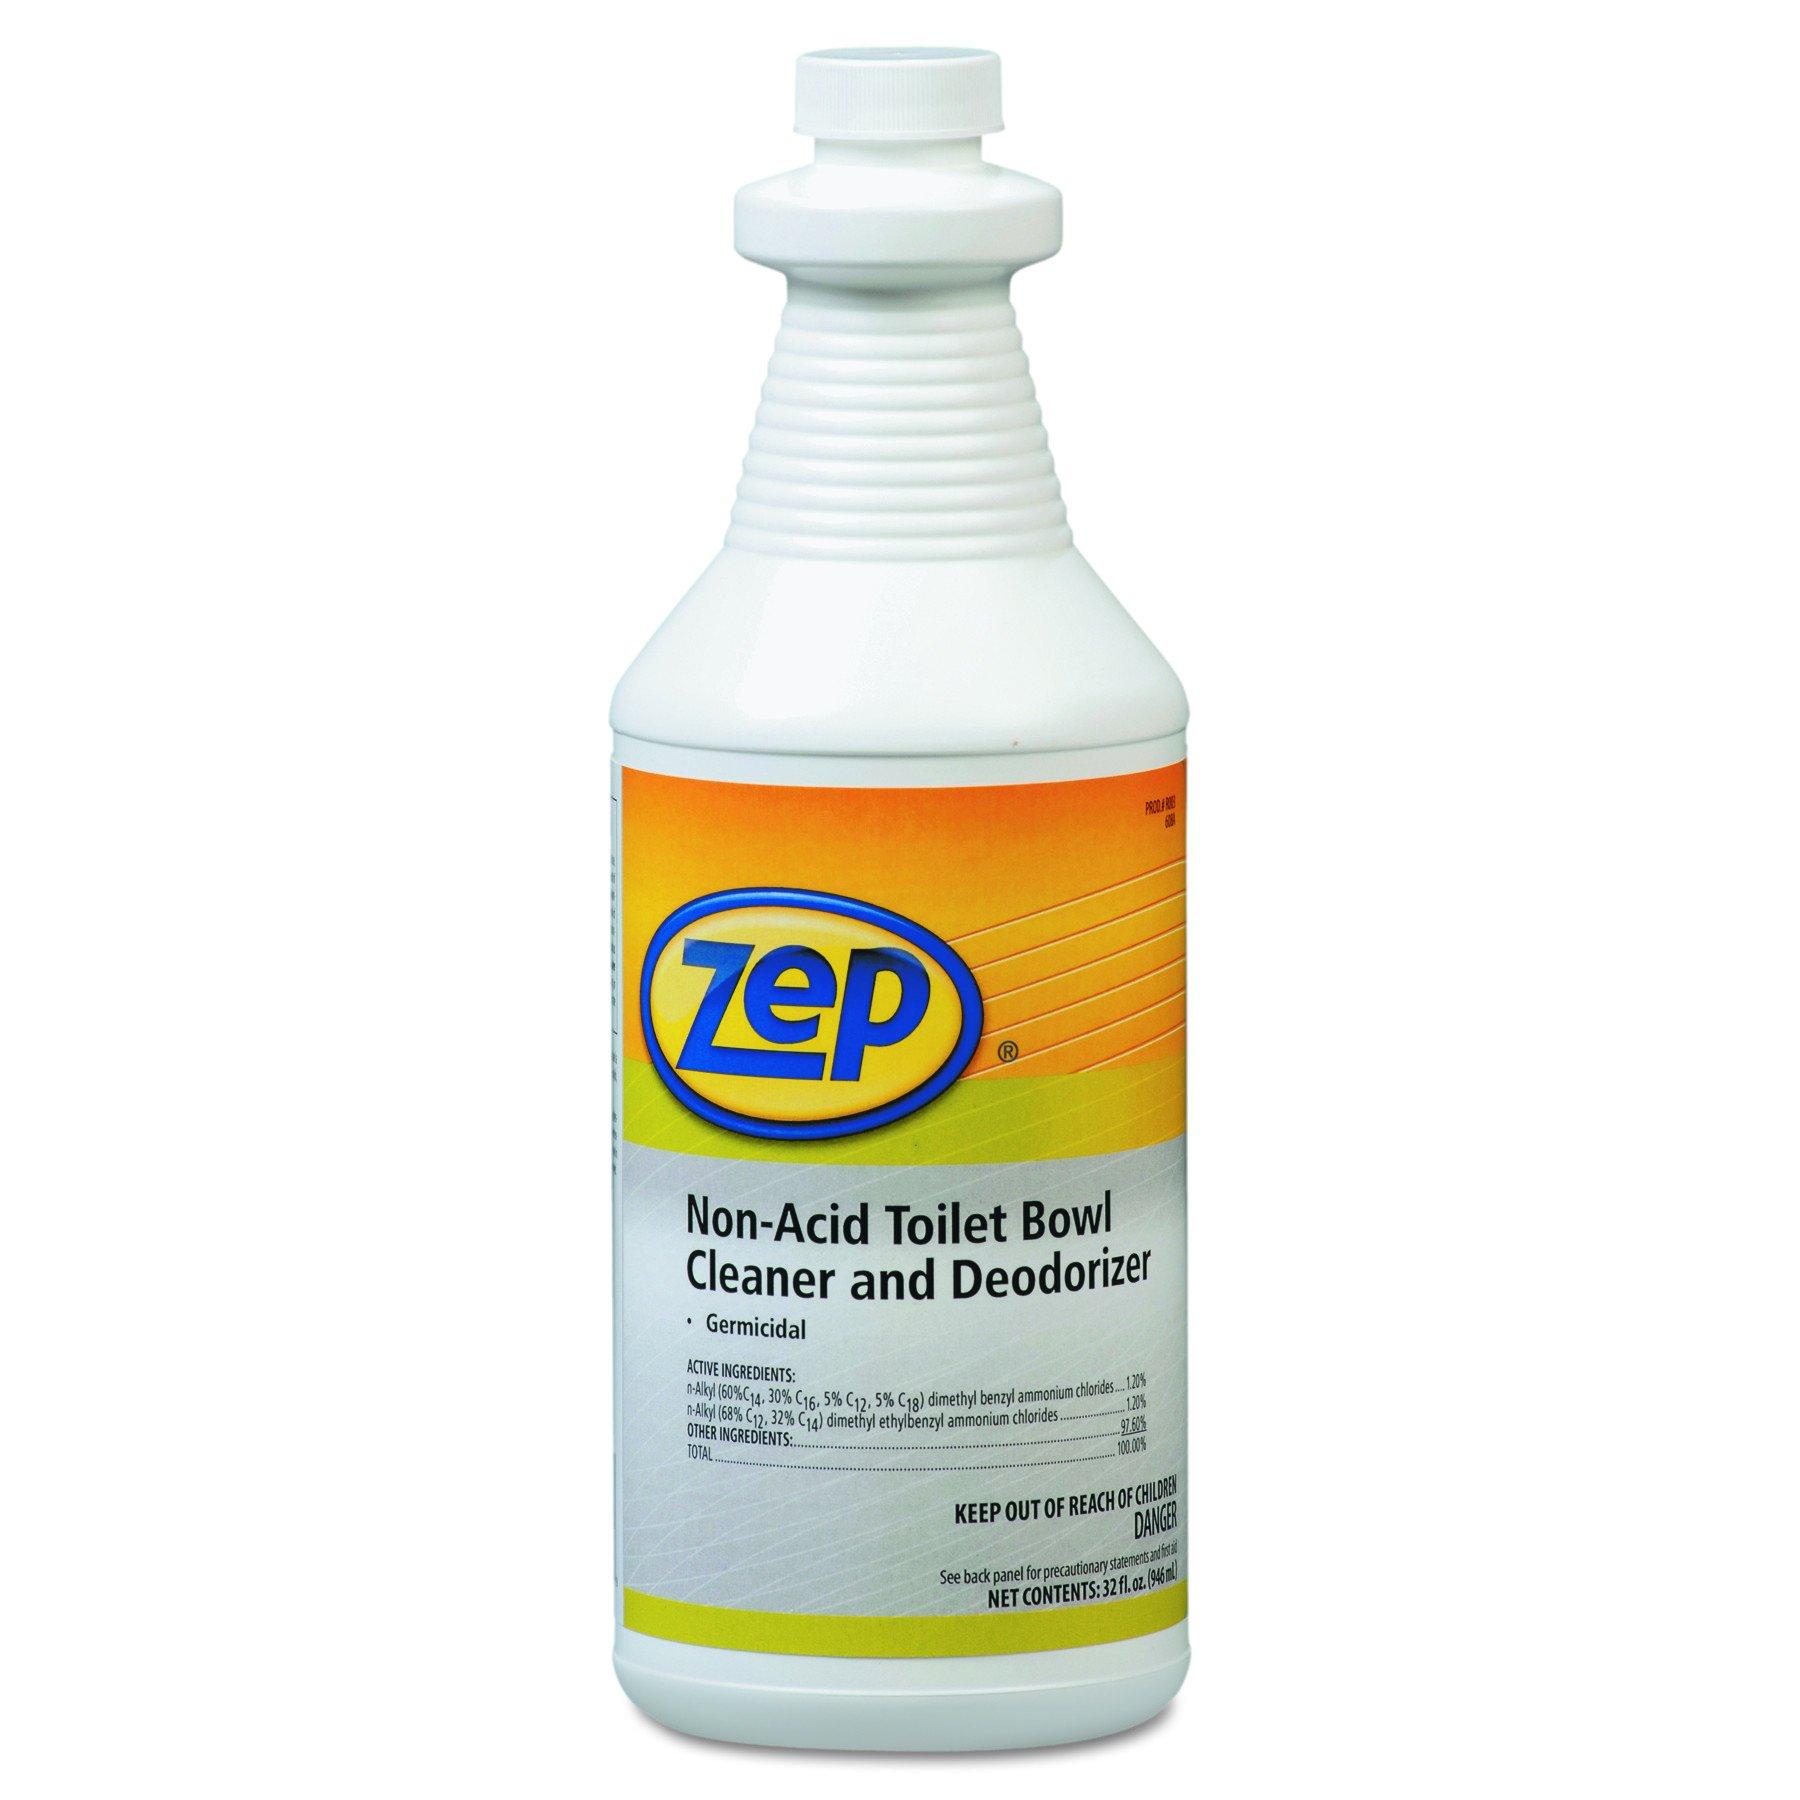 Zep Professional 1041410 Toilet Bowl Cleaner, Non-Acid, qt, Bottle (Pack of 12)